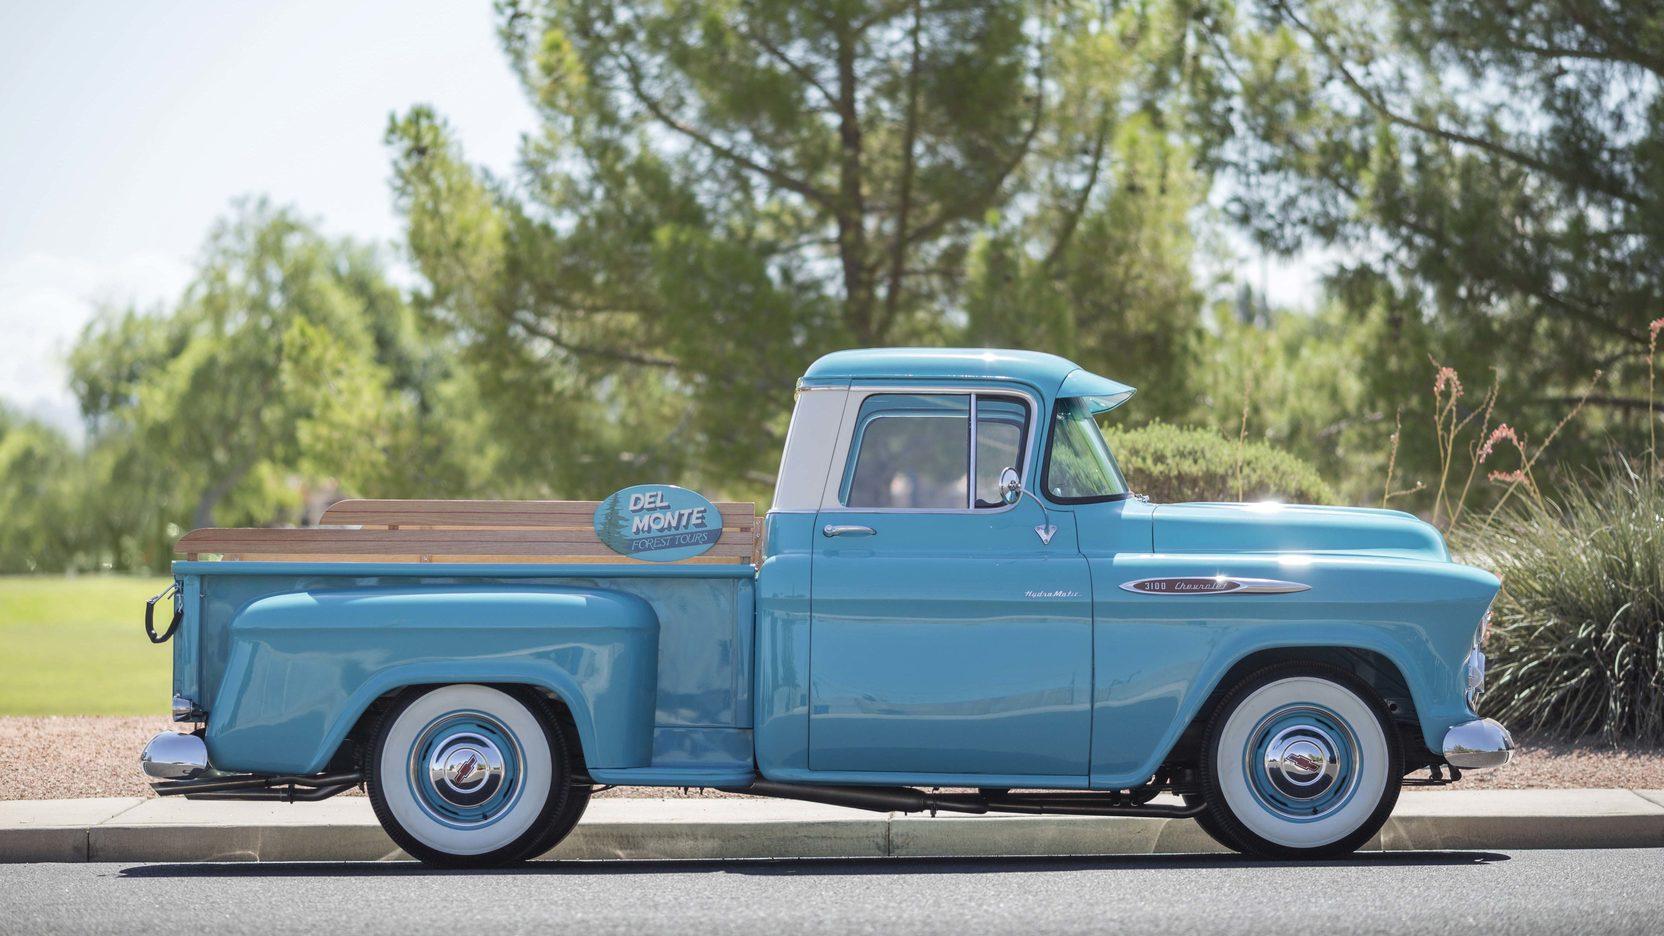 1957 chevrolet pickup 2 full screen [ 1664 x 936 Pixel ]